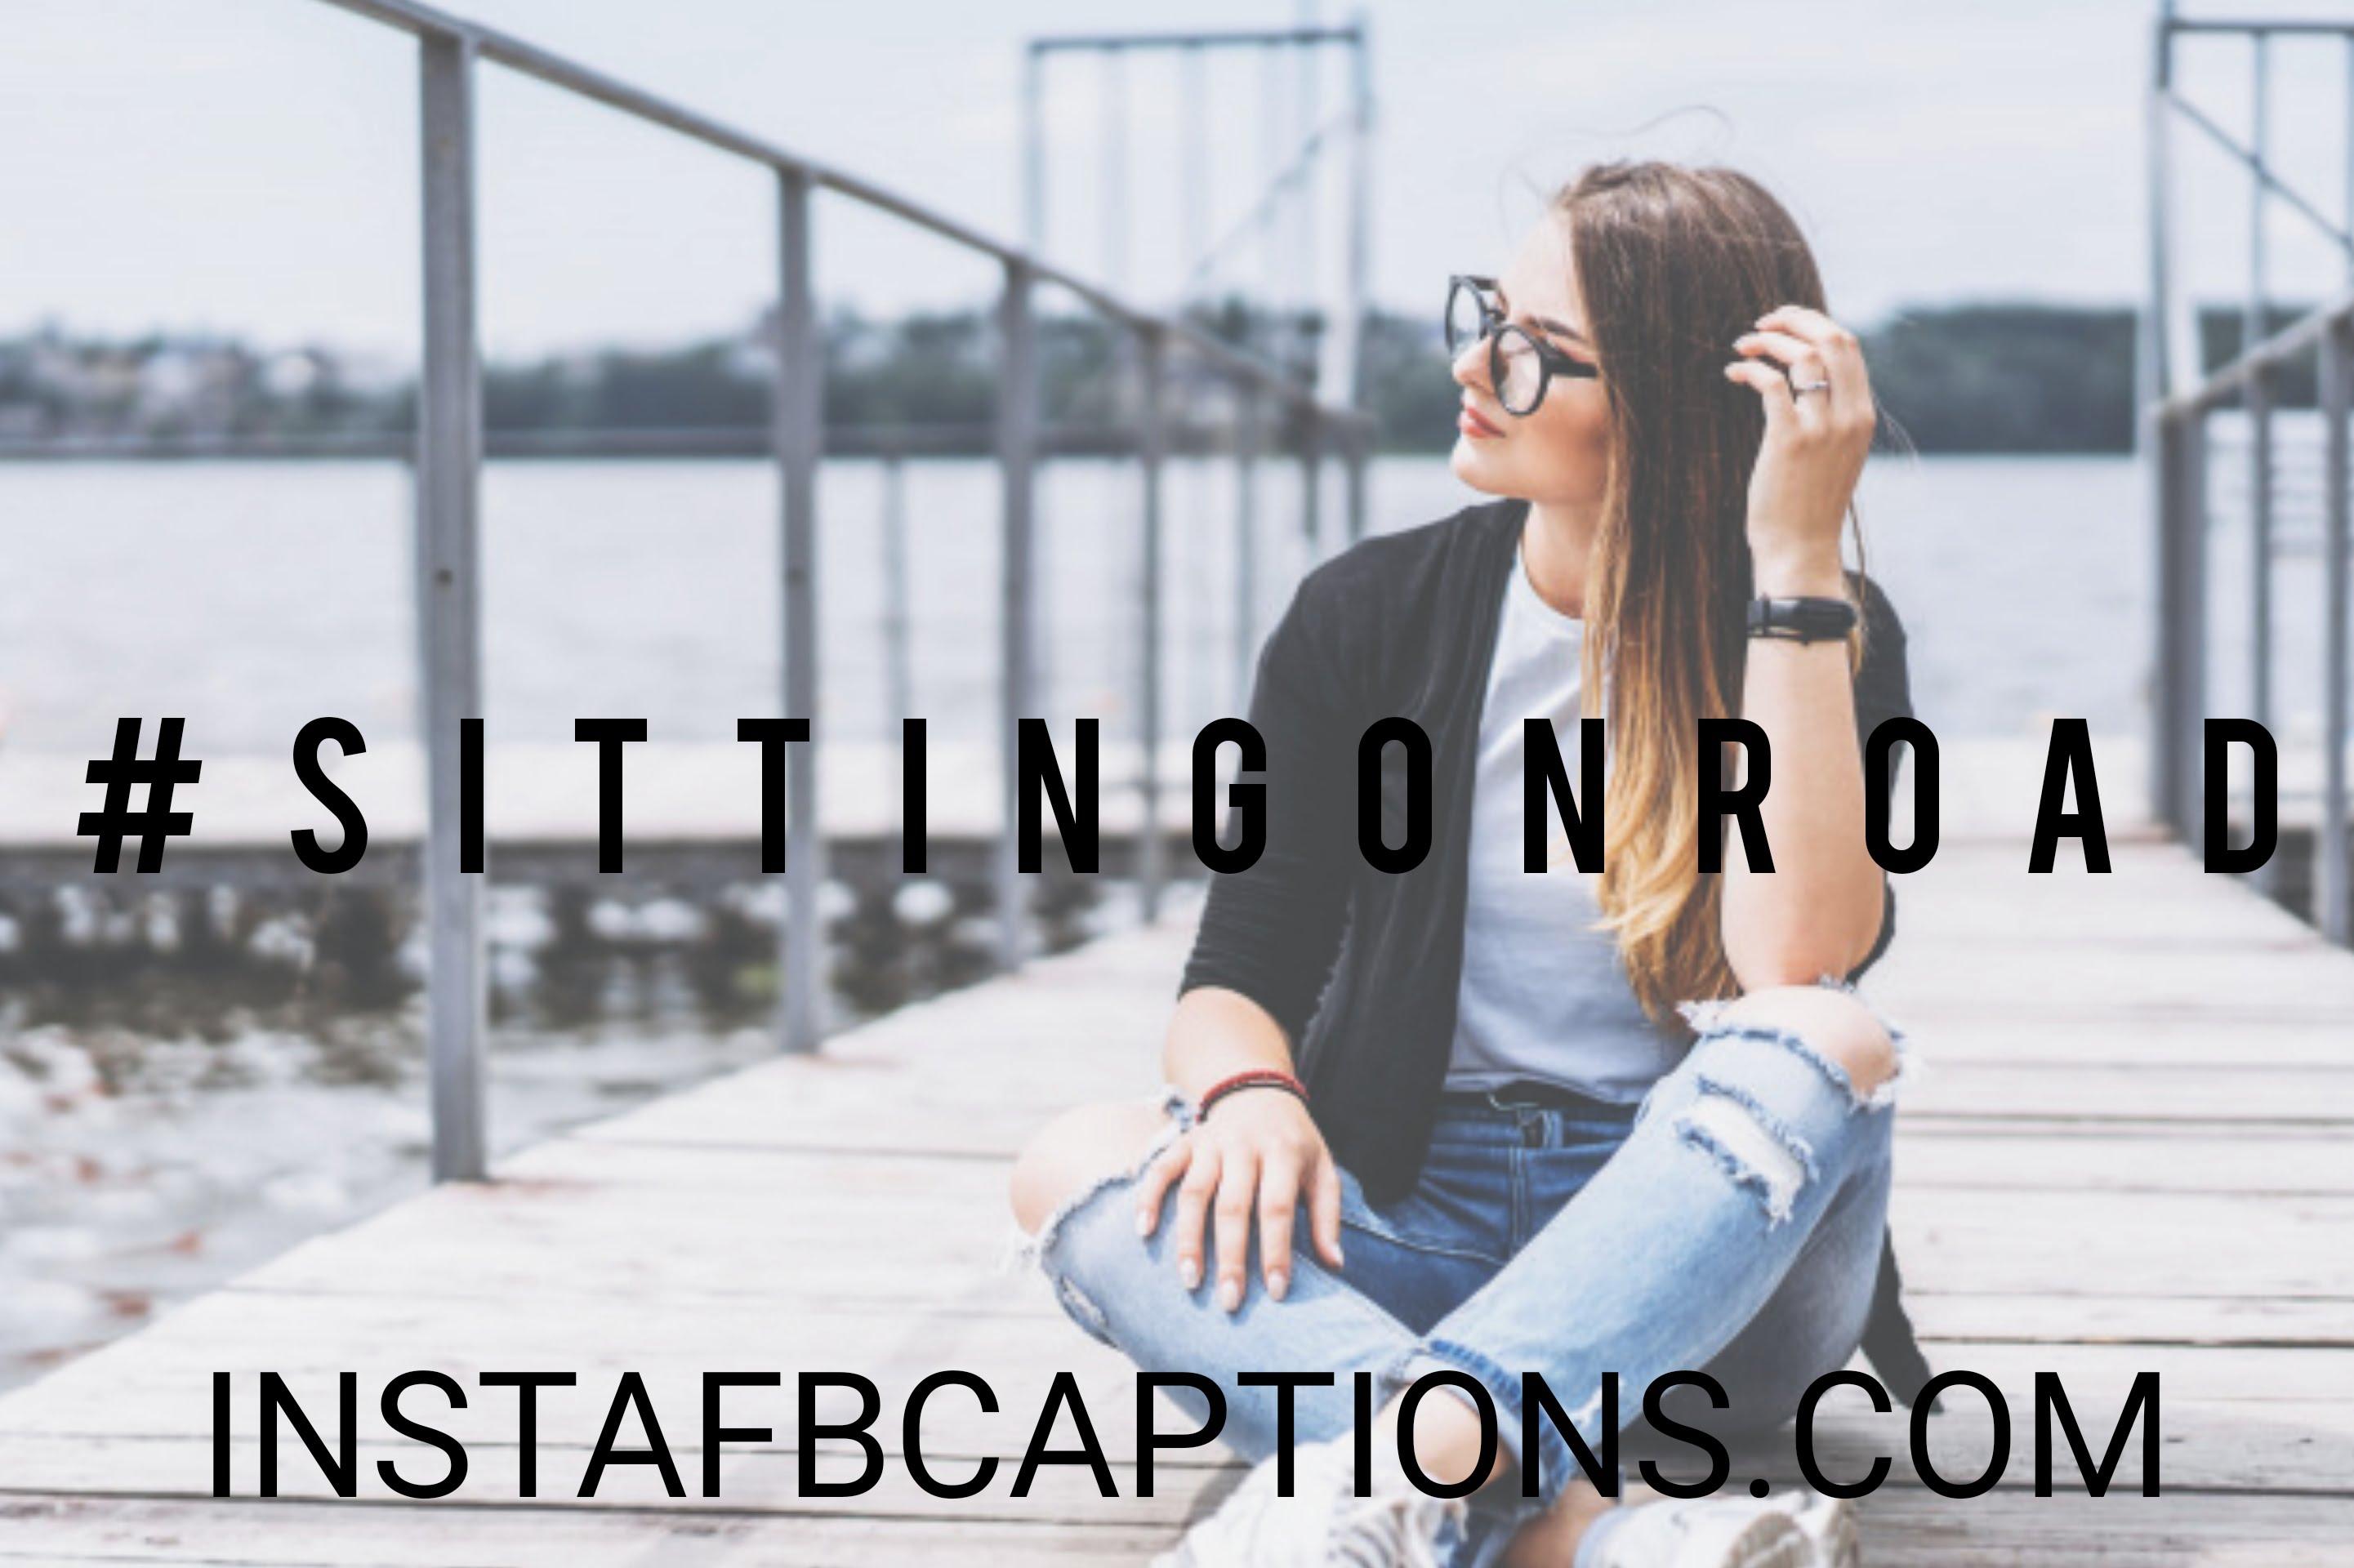 Sitting Pose Hashtags  - Sitting Pose Hashtags - 120+ SITTING POSE Instagram captions 2021